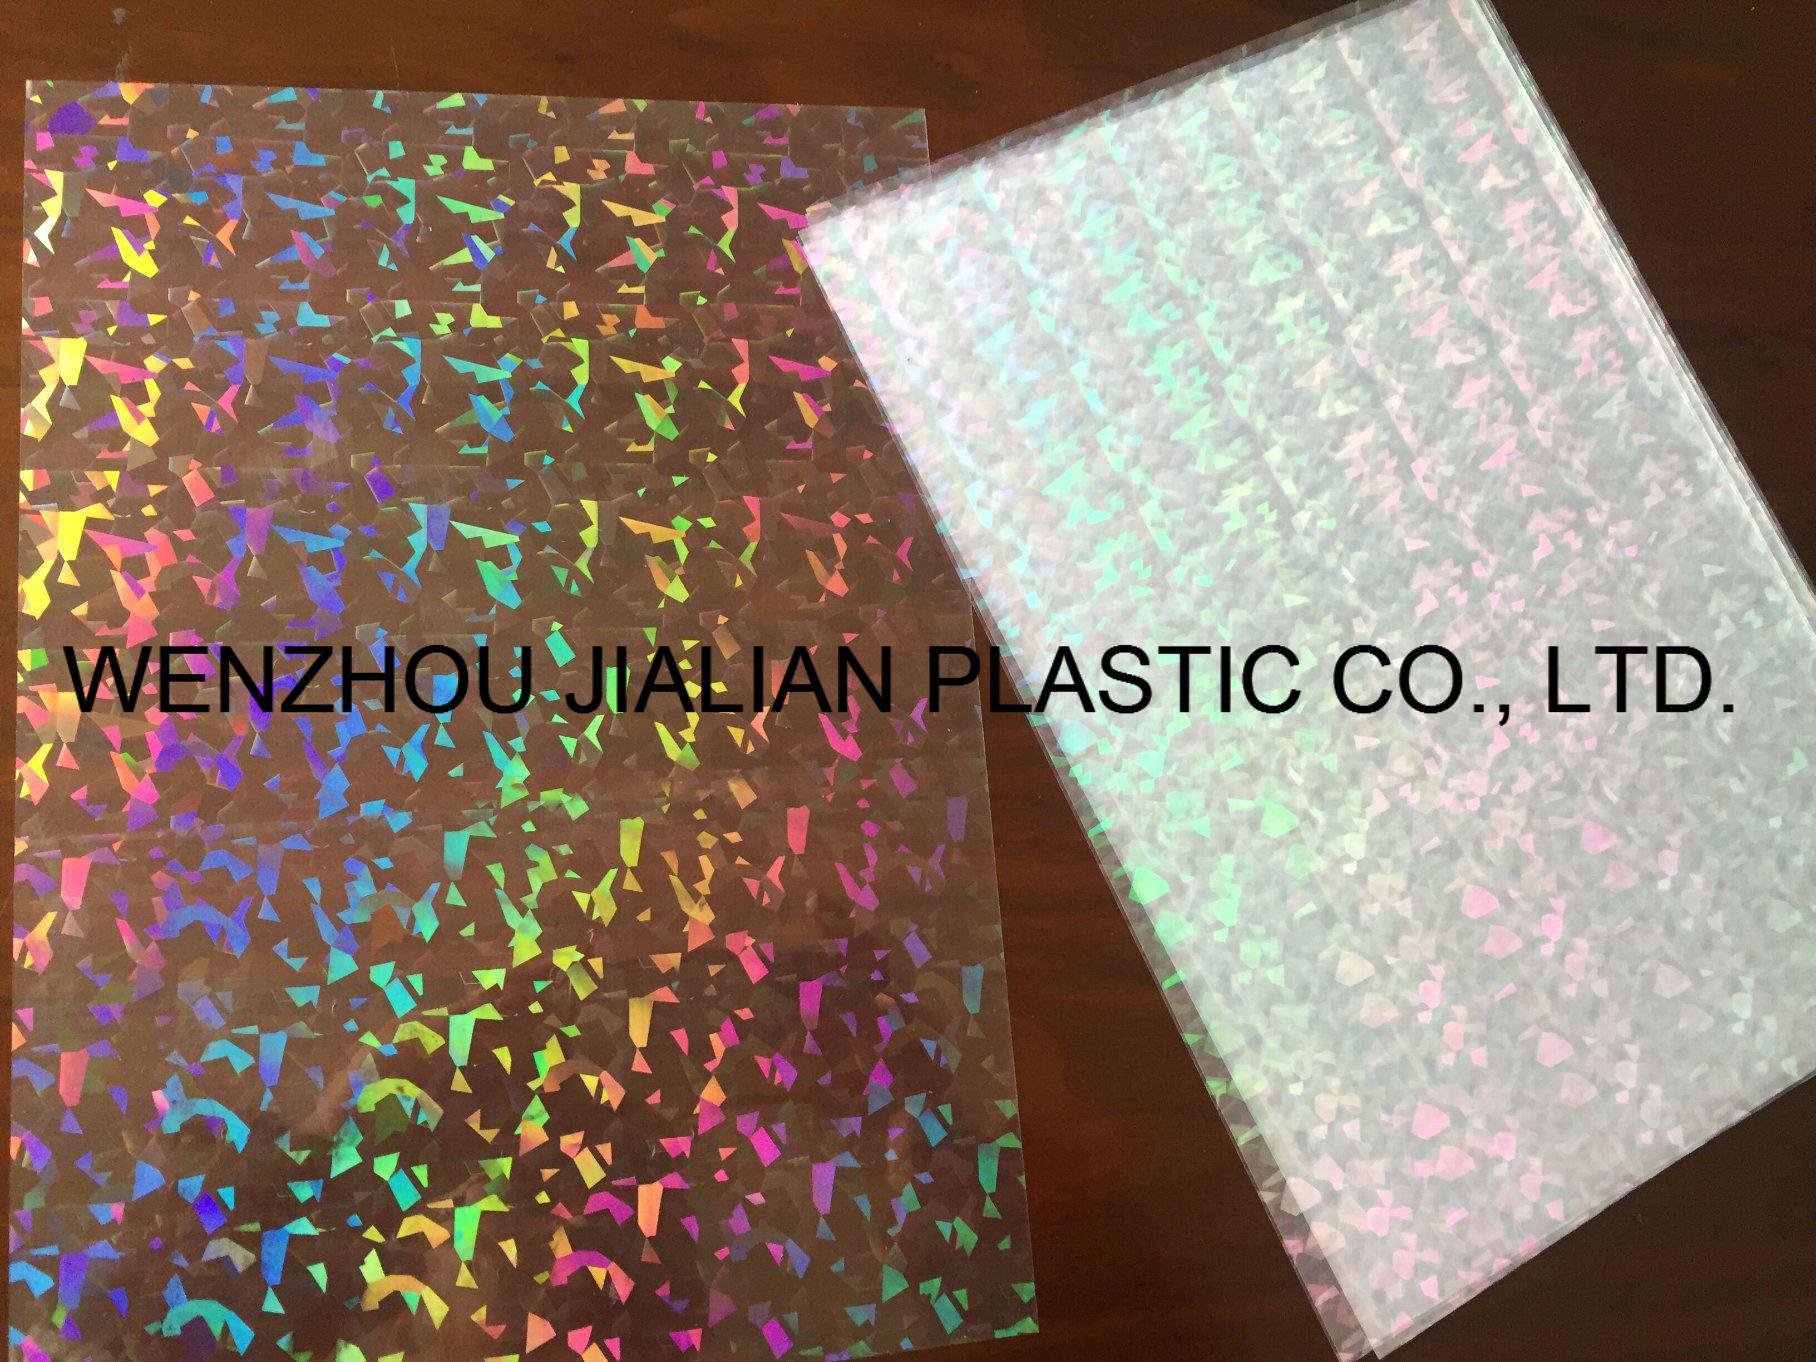 Rigid Transparent Holographic/Laser PVC Film for Christmas Decorations